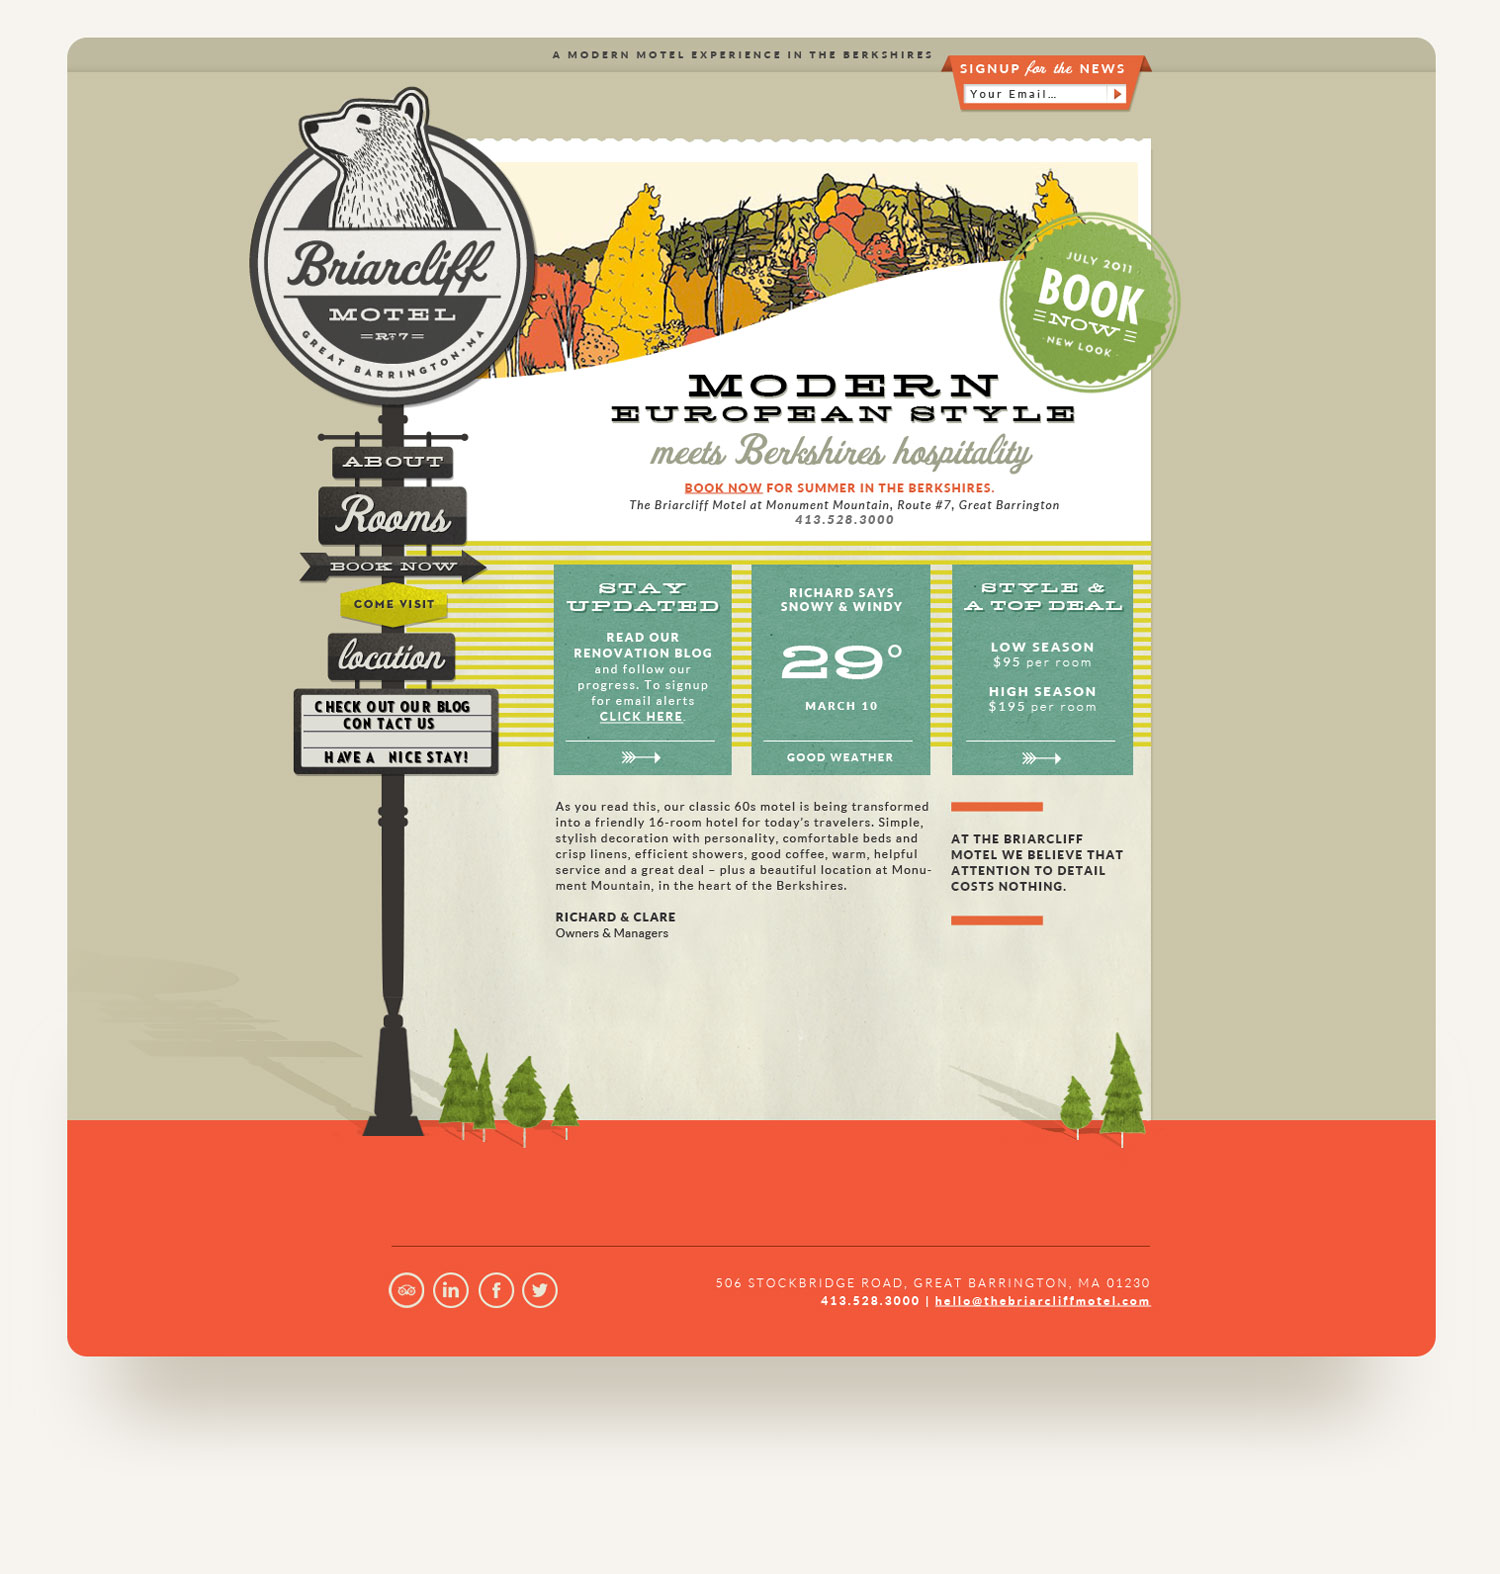 The Briarcliff Motel website design. Bear logo, retro signage navigation. design by brittany hurdle beckon webeckon